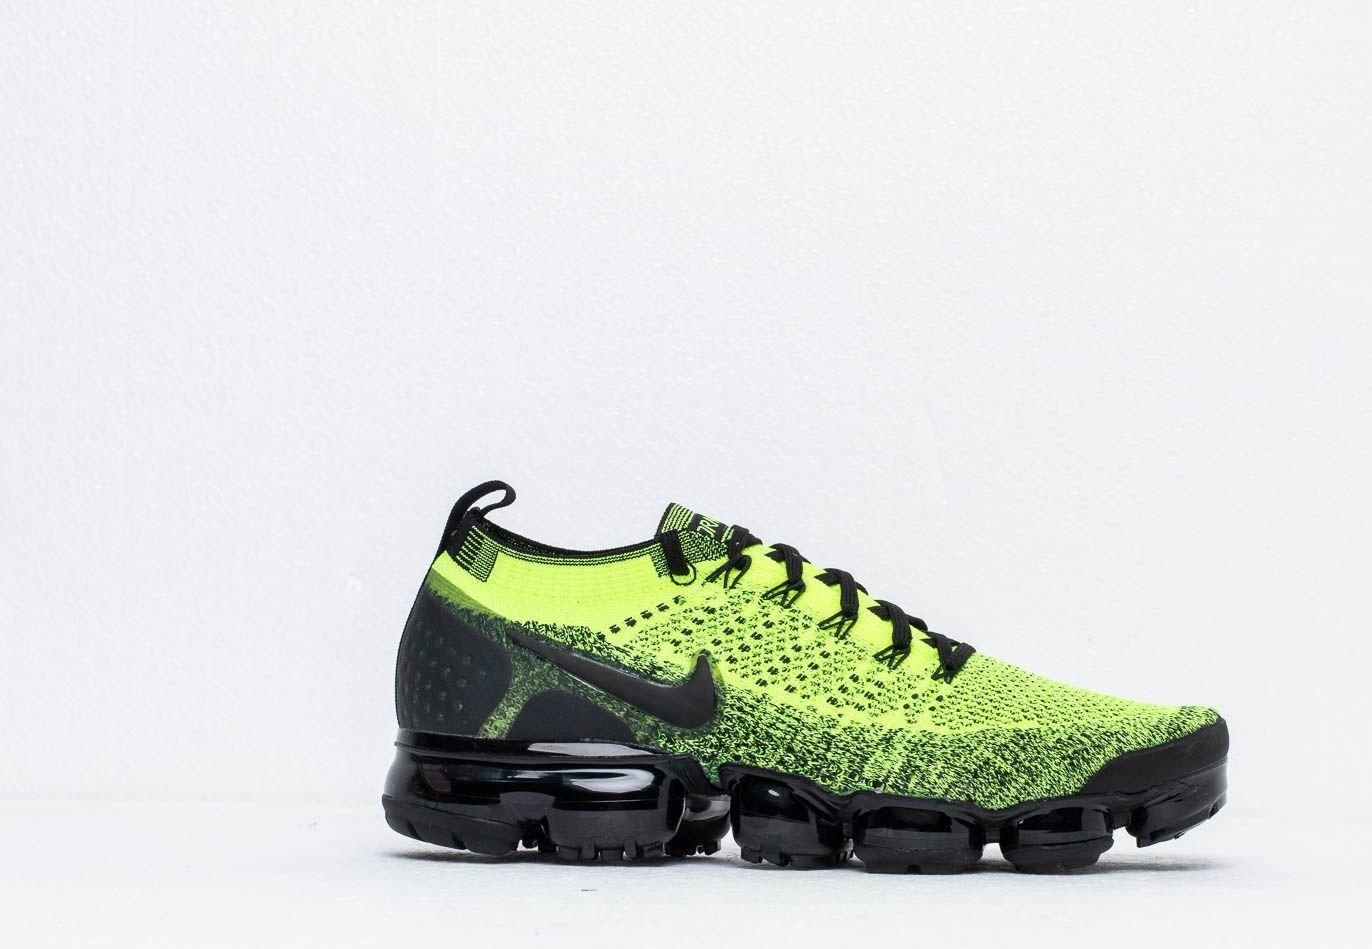 Nike Air Vapormax Flyknit 2 in Yellow